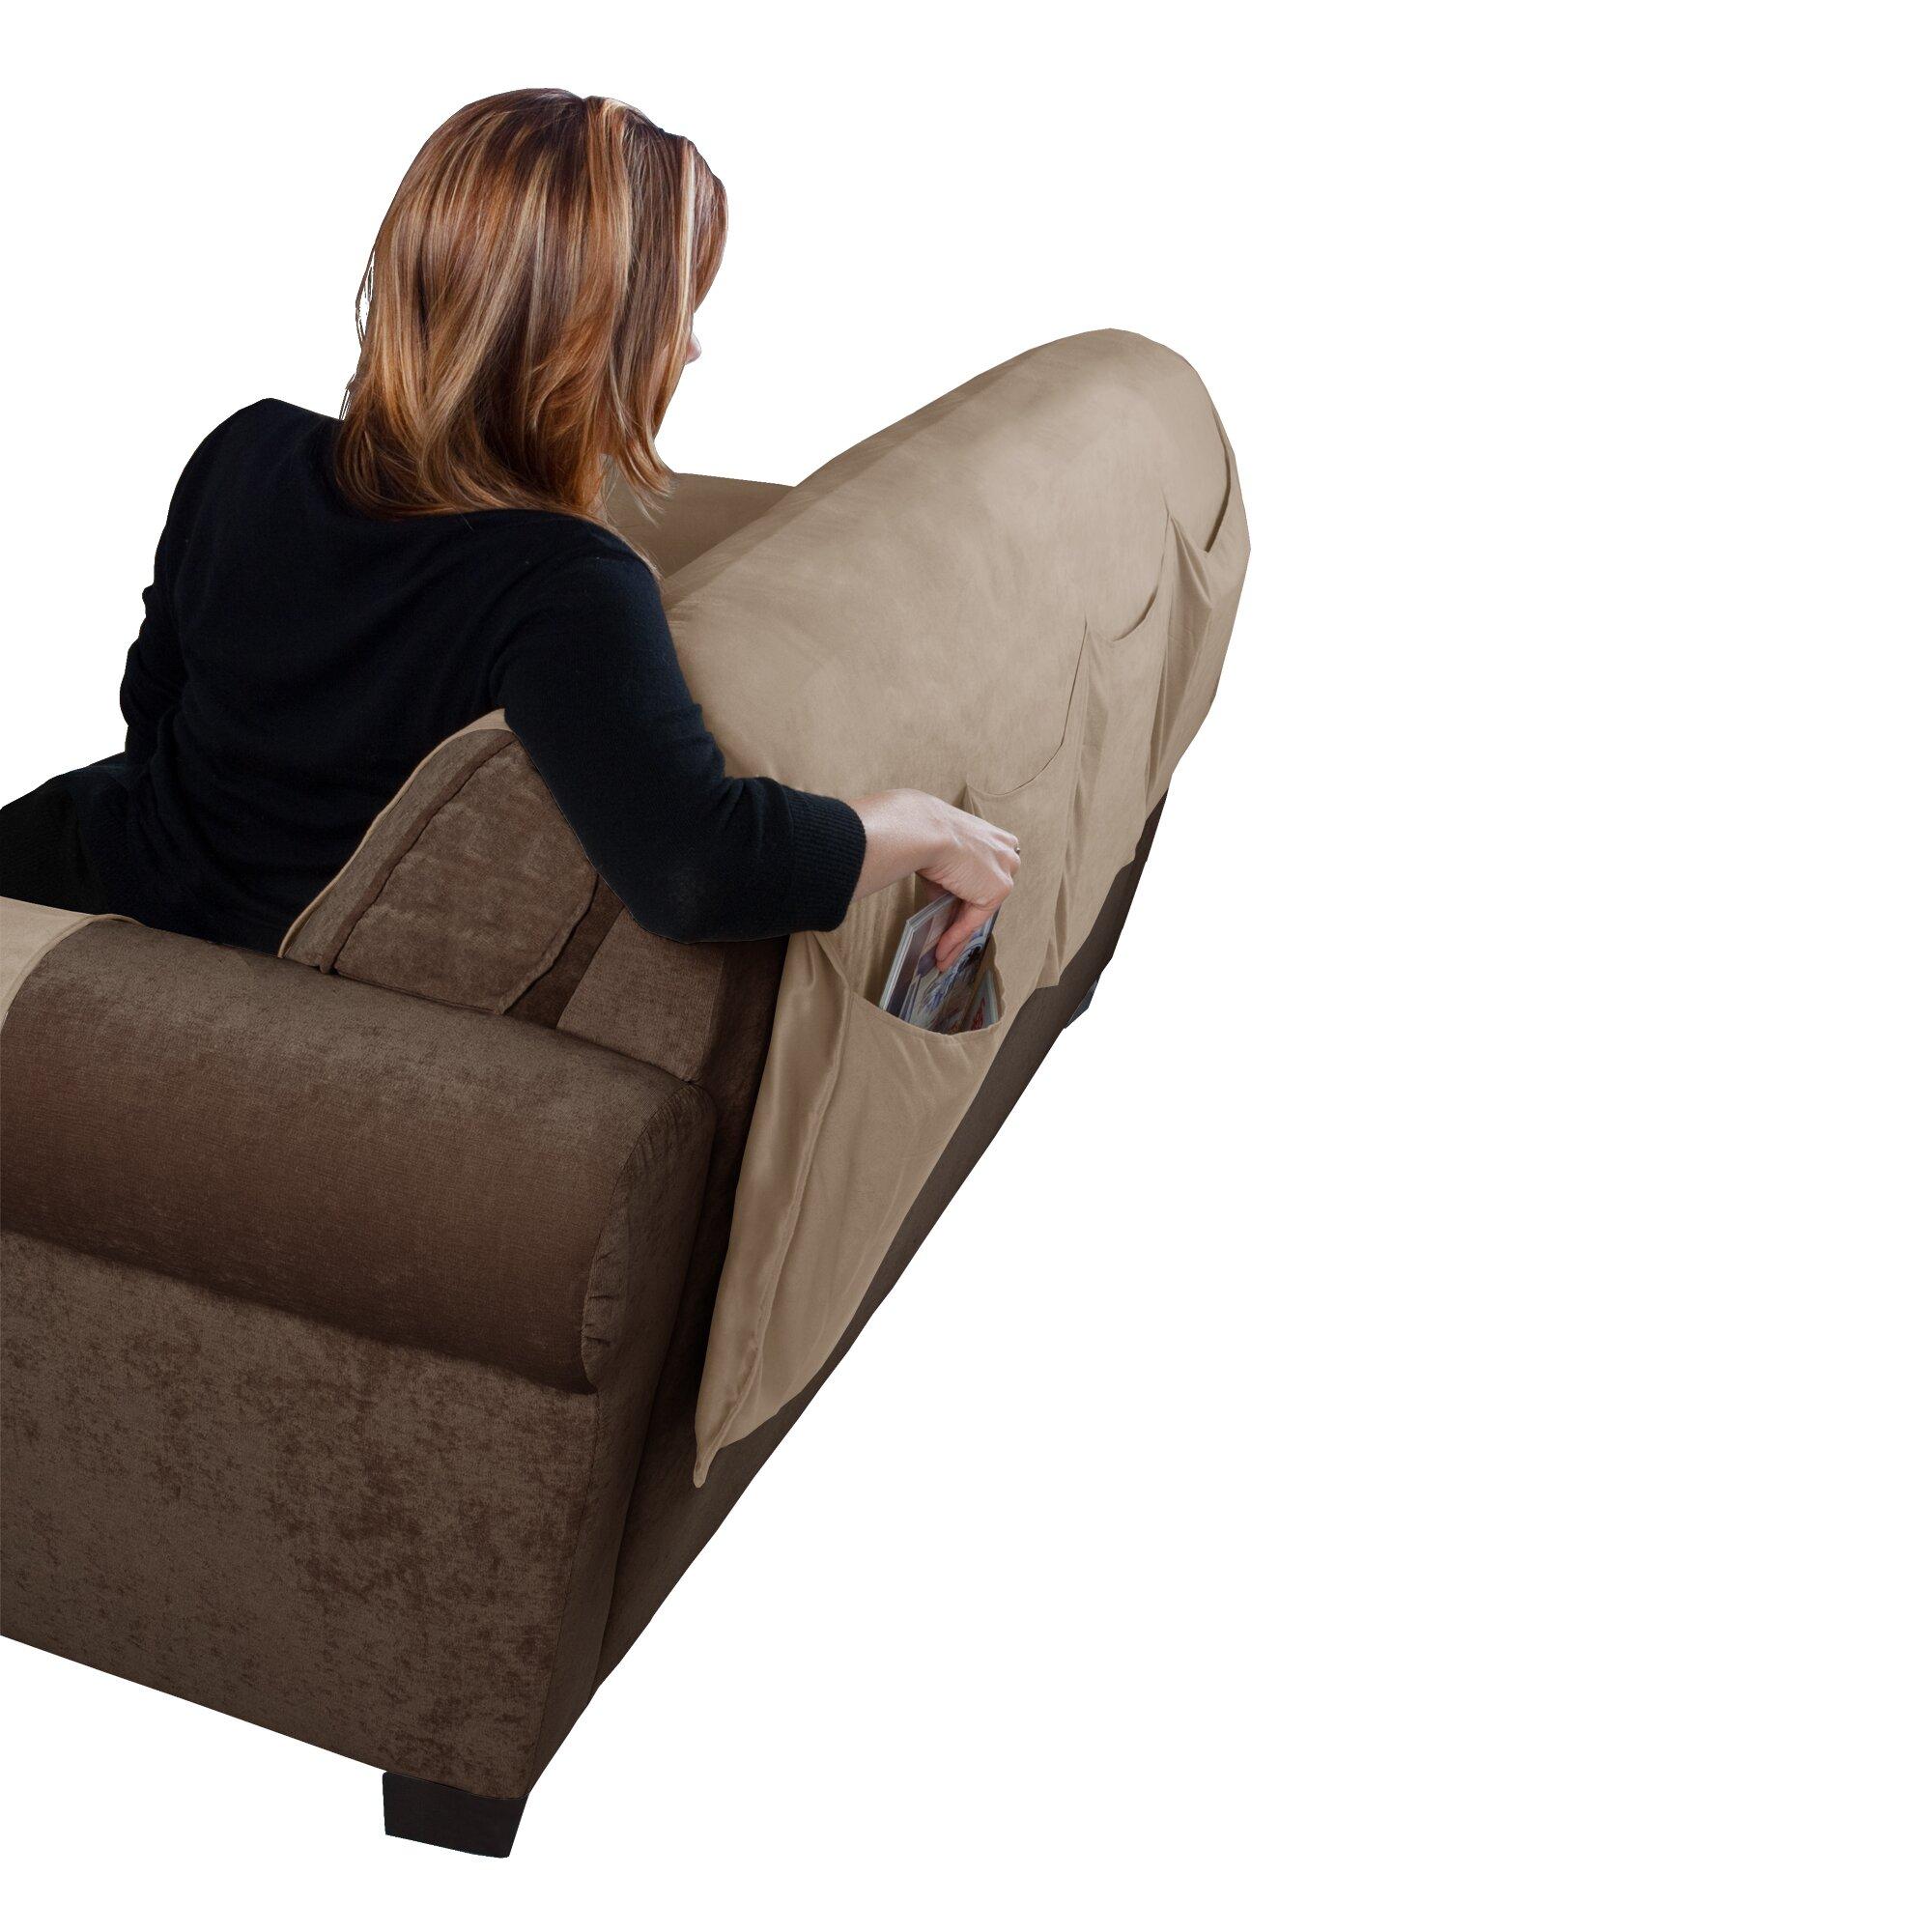 Maytex 3 Piece Sofa Pet Furniture Cover Set & Reviews